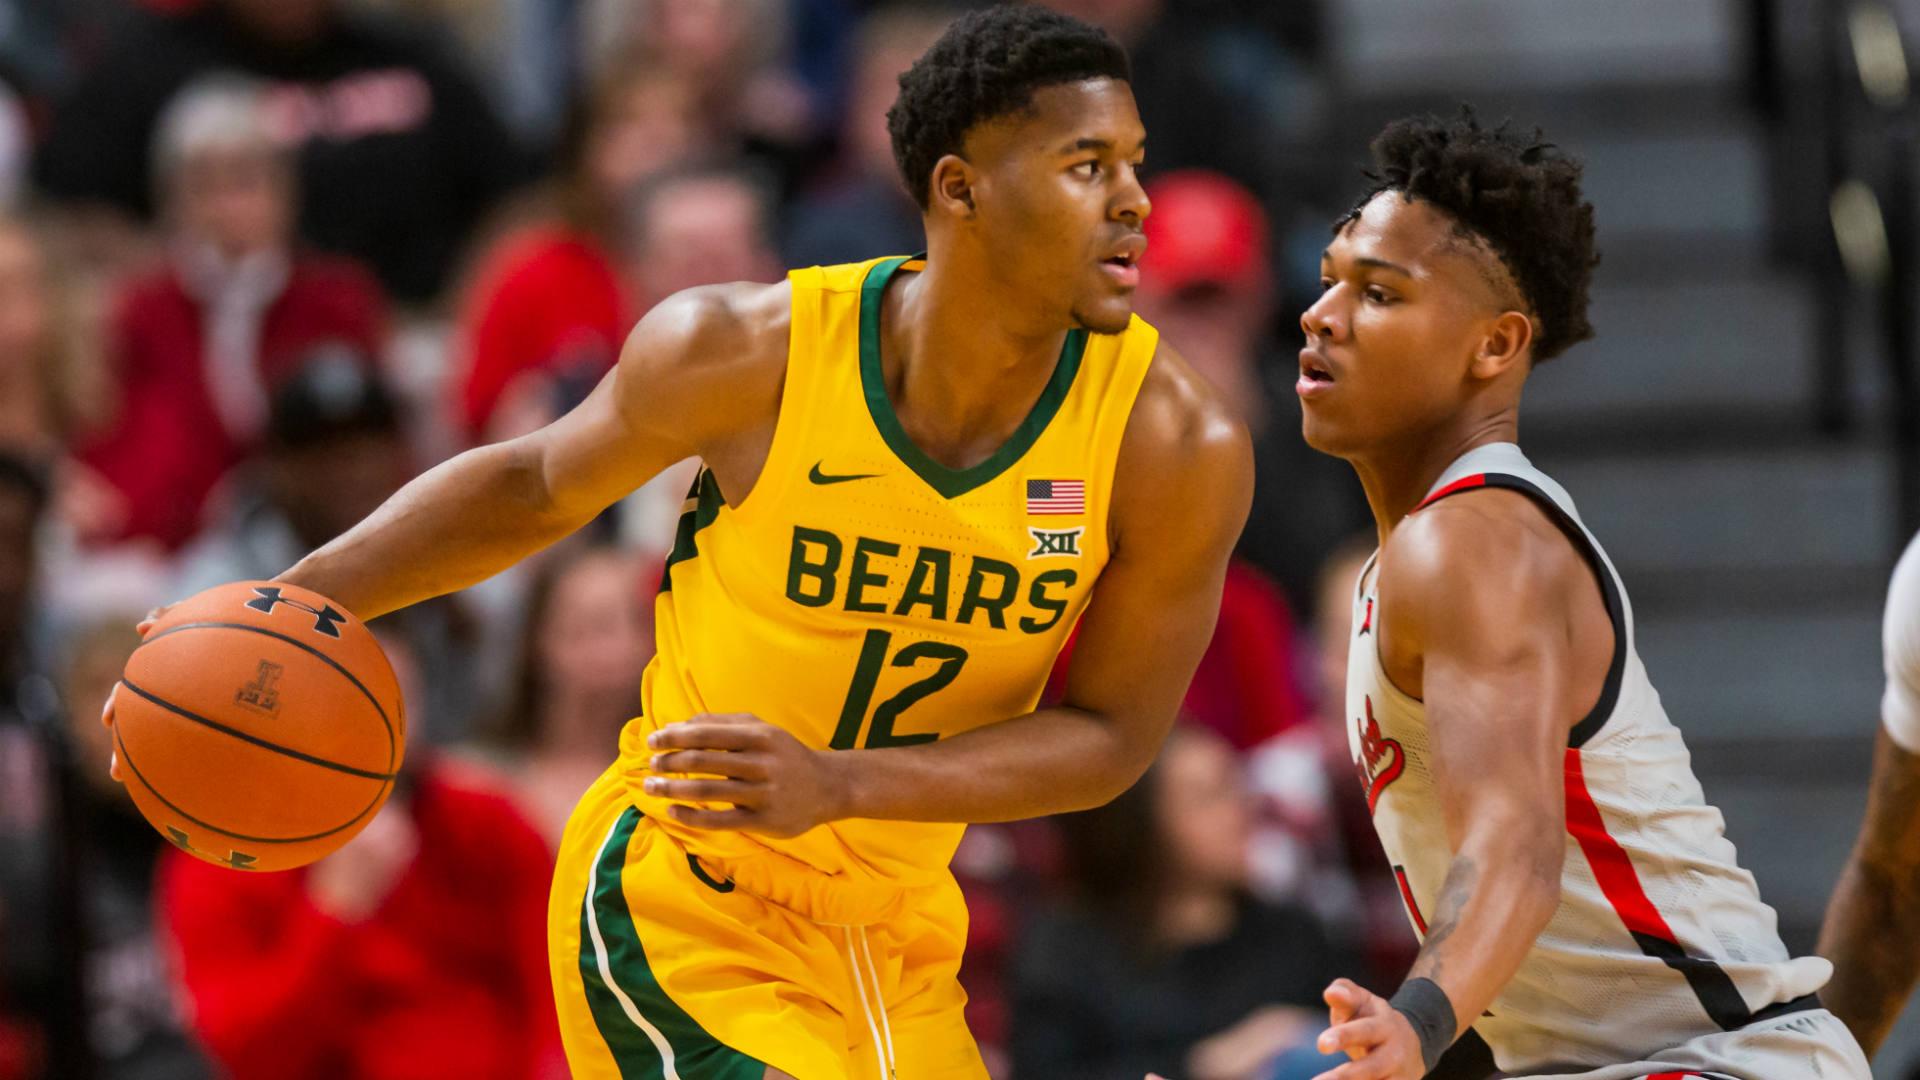 NBA Draft 2020 withdrawal deadline winners & losers: Baylor stays strong, Stanford steps backward 1